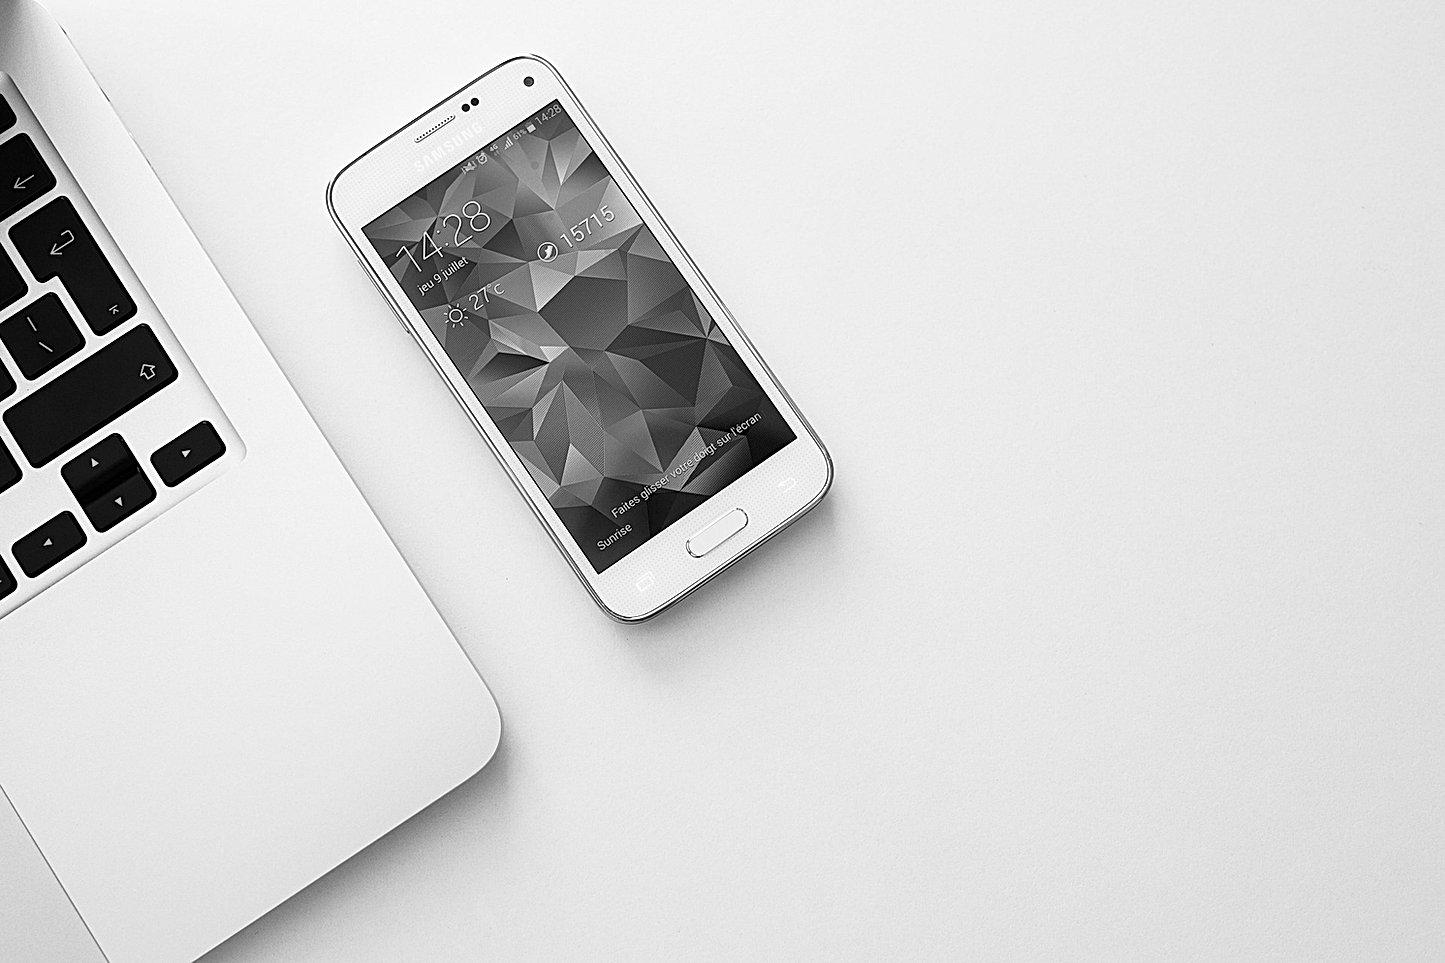 smartphone-925758_1920.jpg